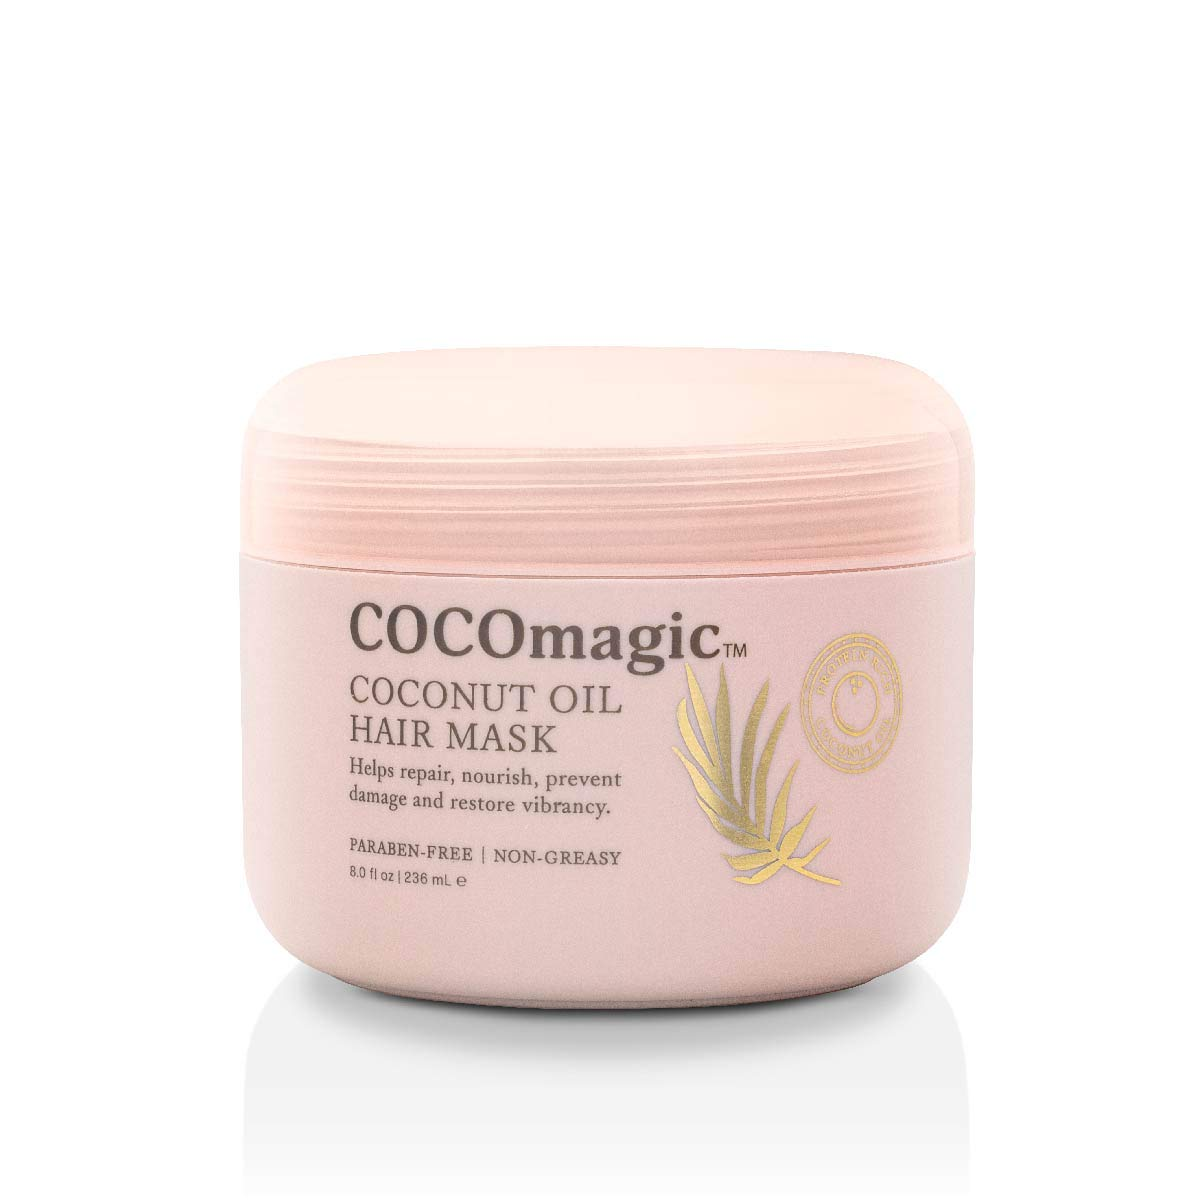 CocoMagic Coconut Japan Maker New Oil Hair Trust Mask Damage - Frizz Prevents Repairs